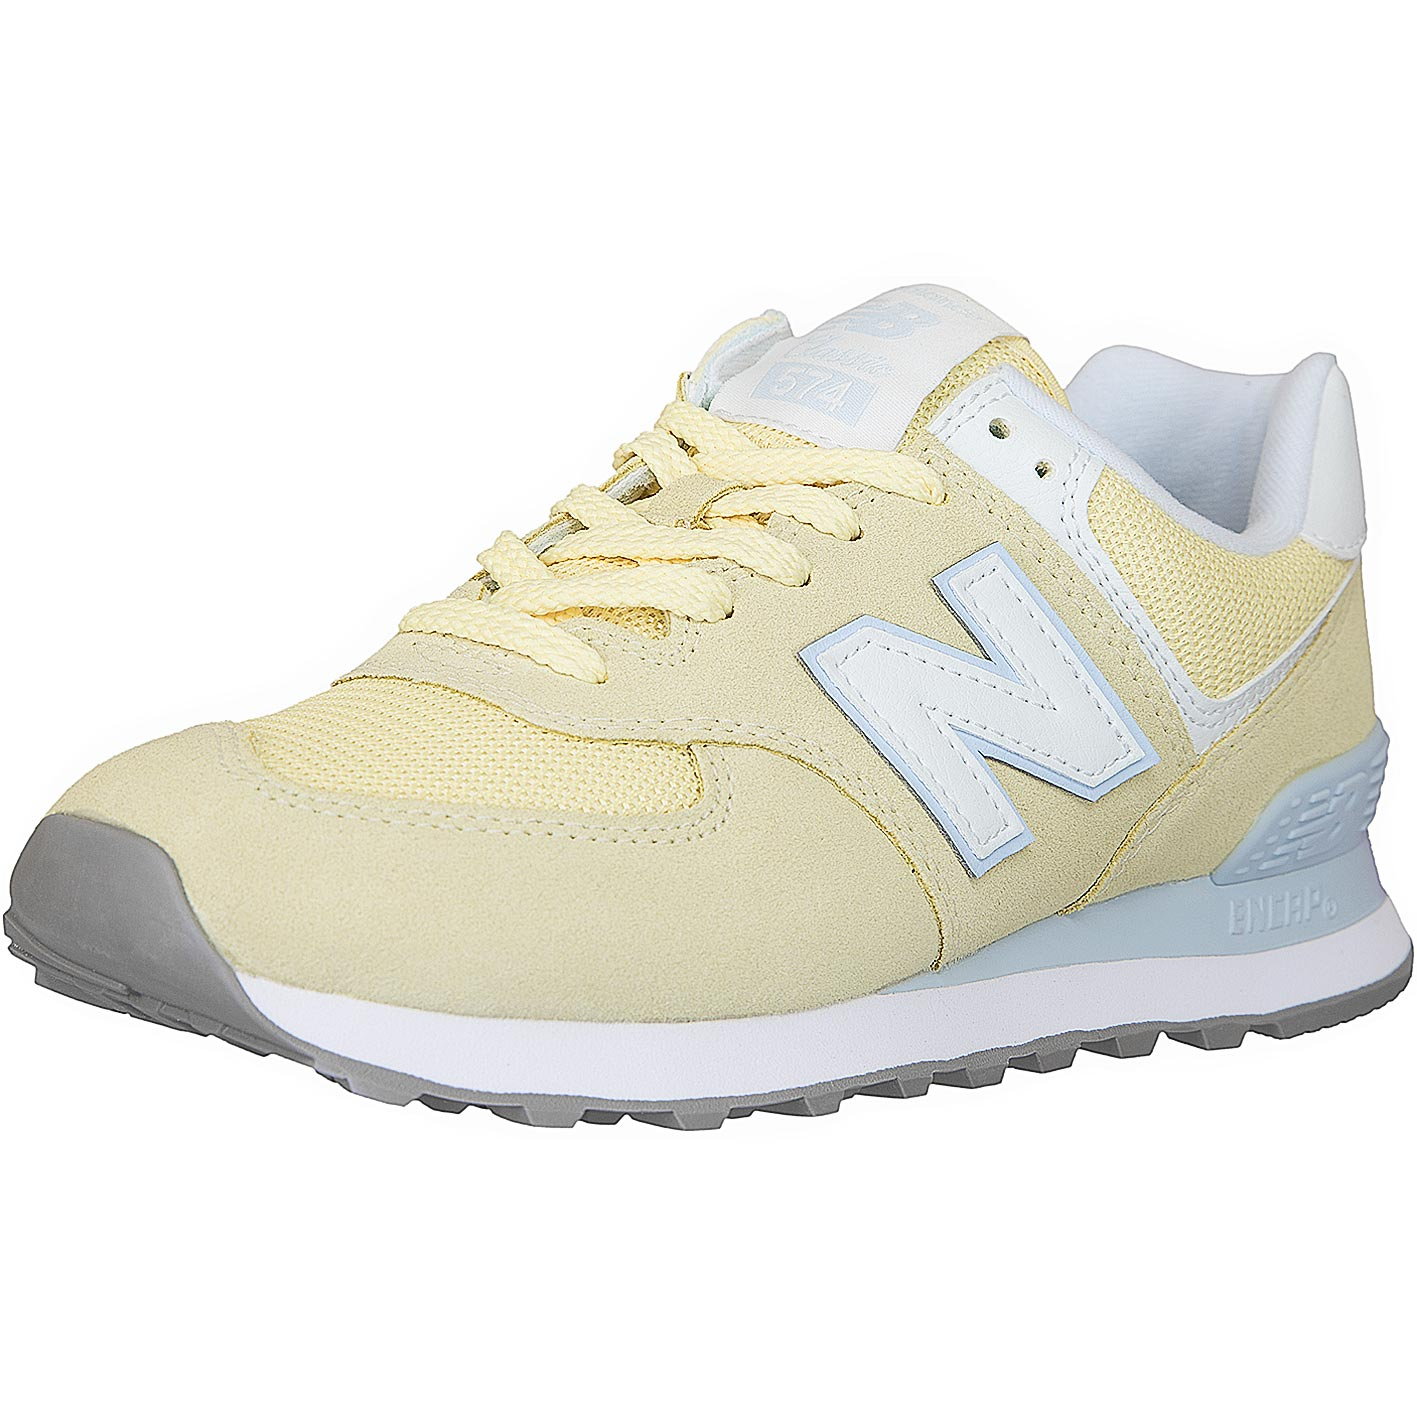 brand new bea74 9027e New Balance Damen Sneaker 574 Wildleder/Mesh gelb